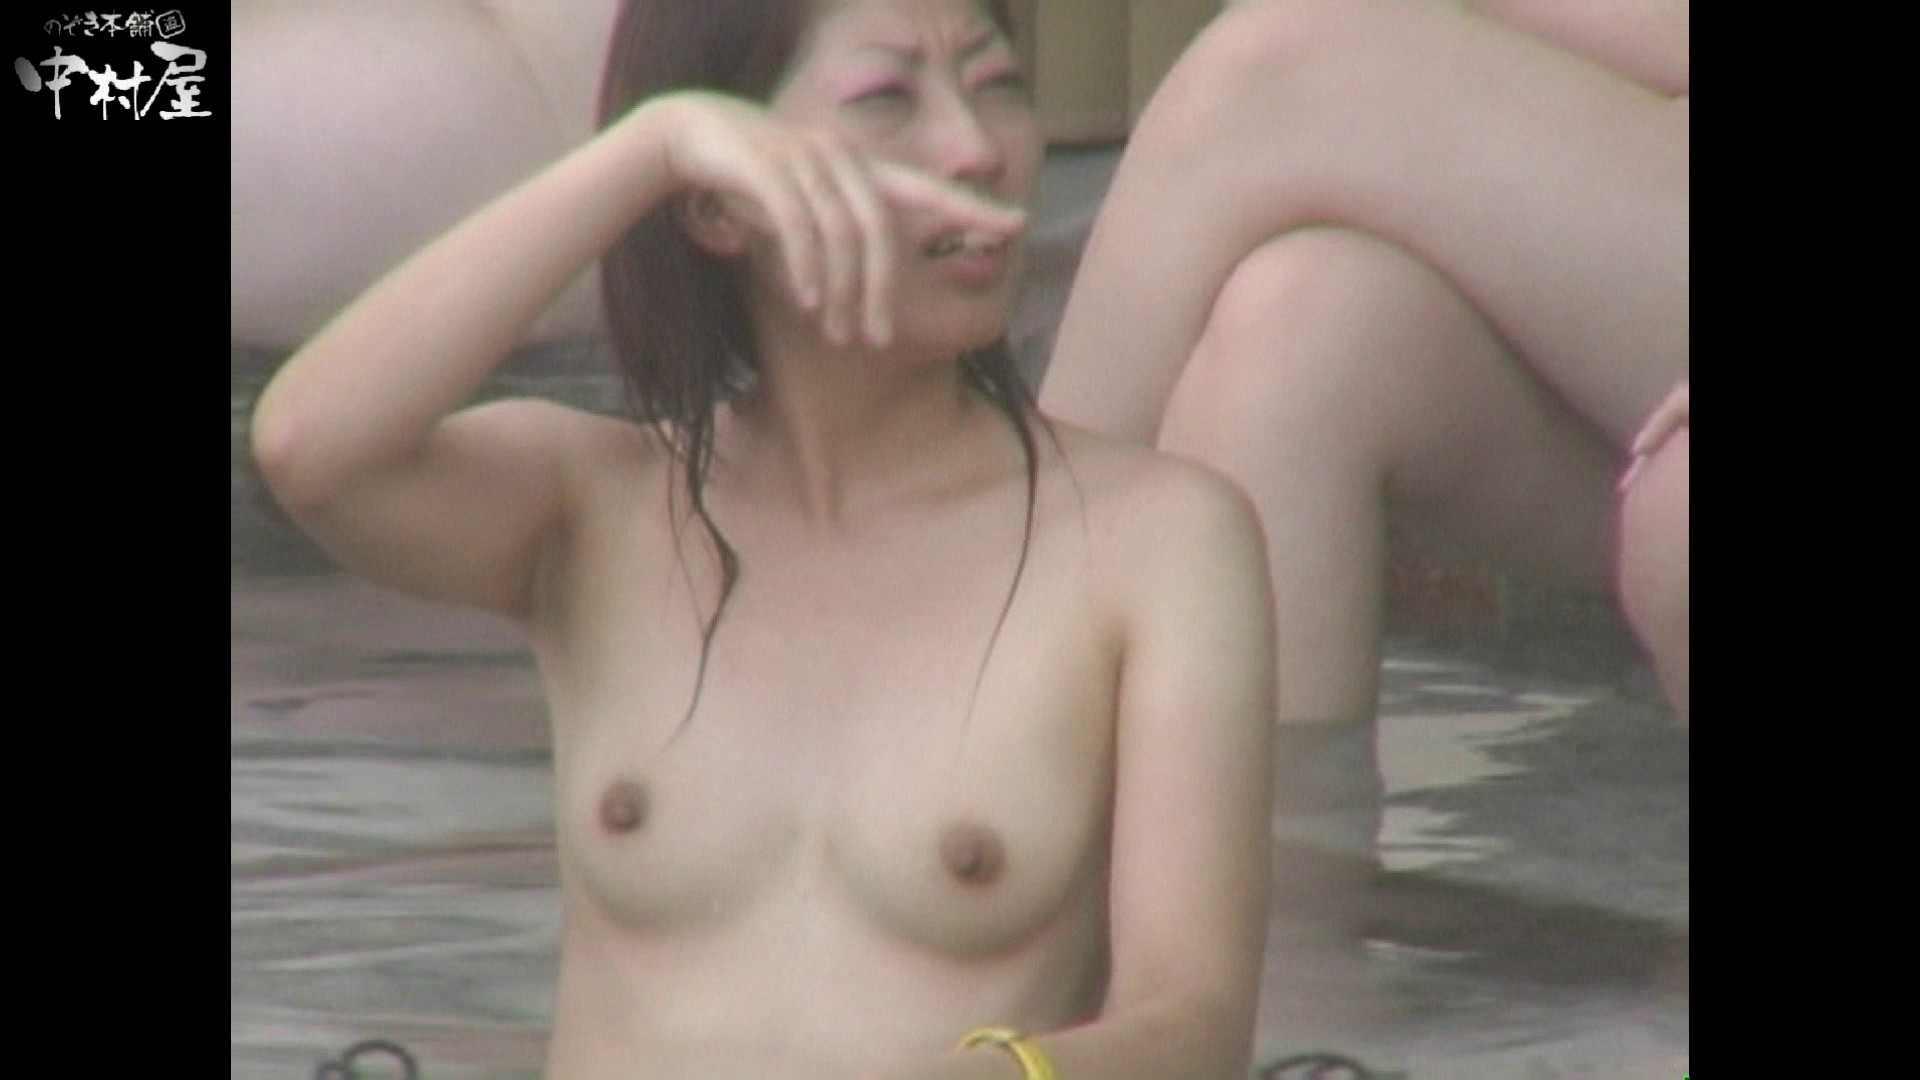 Aquaな露天風呂Vol.940 OLセックス | 露天  98画像 34